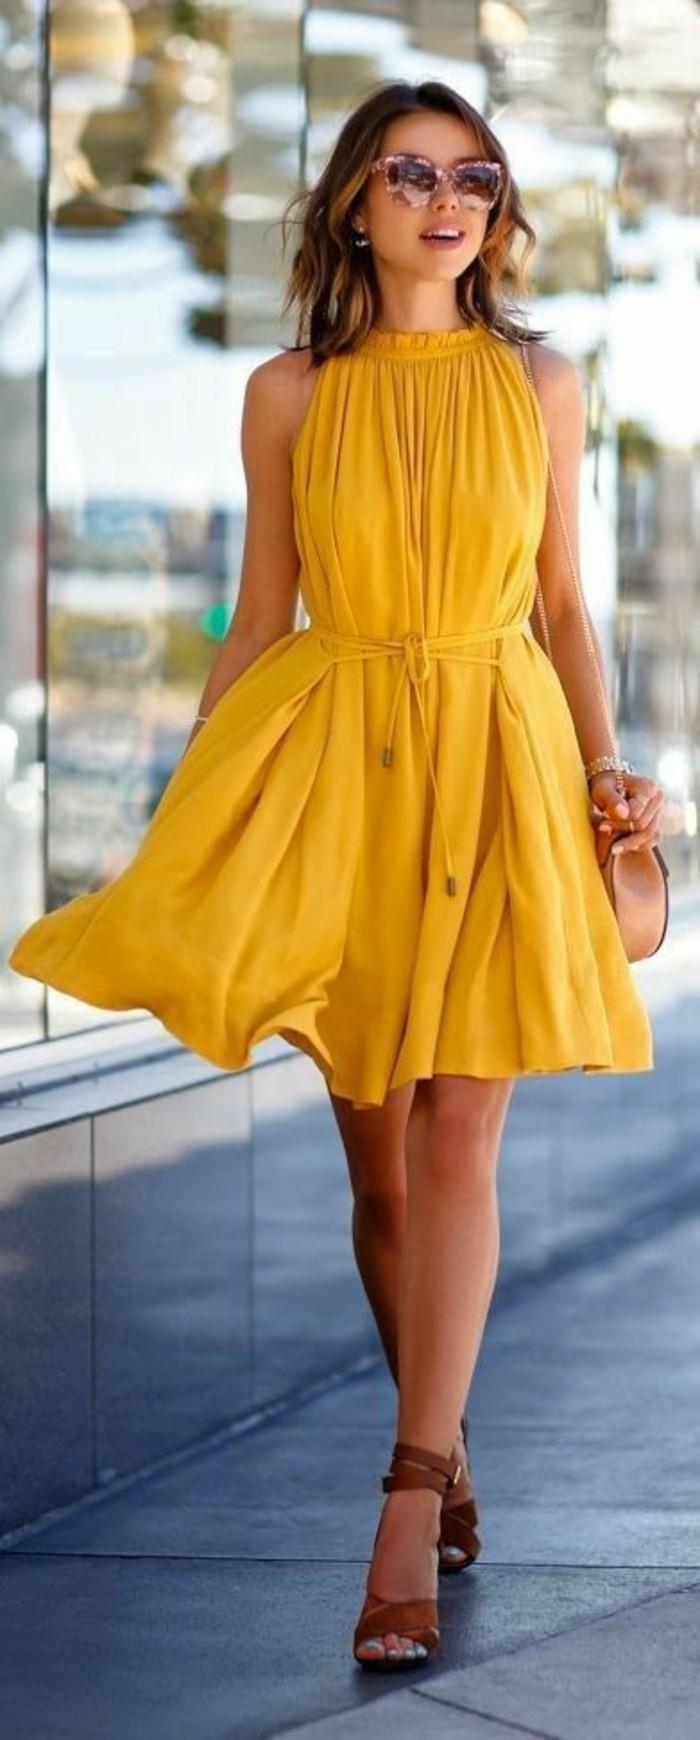 tenue-casual-chic-femme-tenue-cool-chic-femme-bien-habillée-robe-jaune-jolie